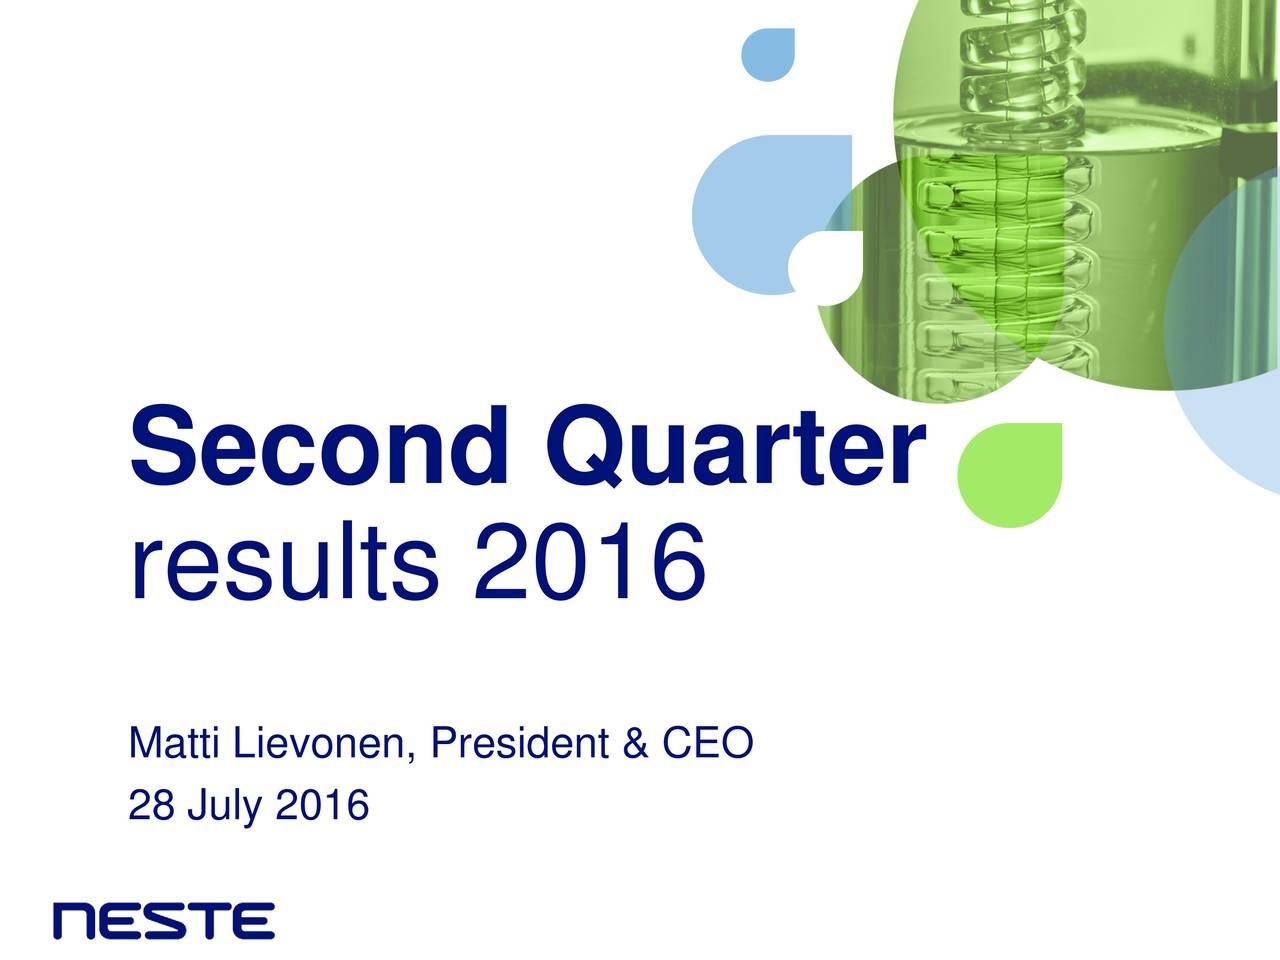 results 2016 Matti Lievonen, President & CEO 28 July 2016